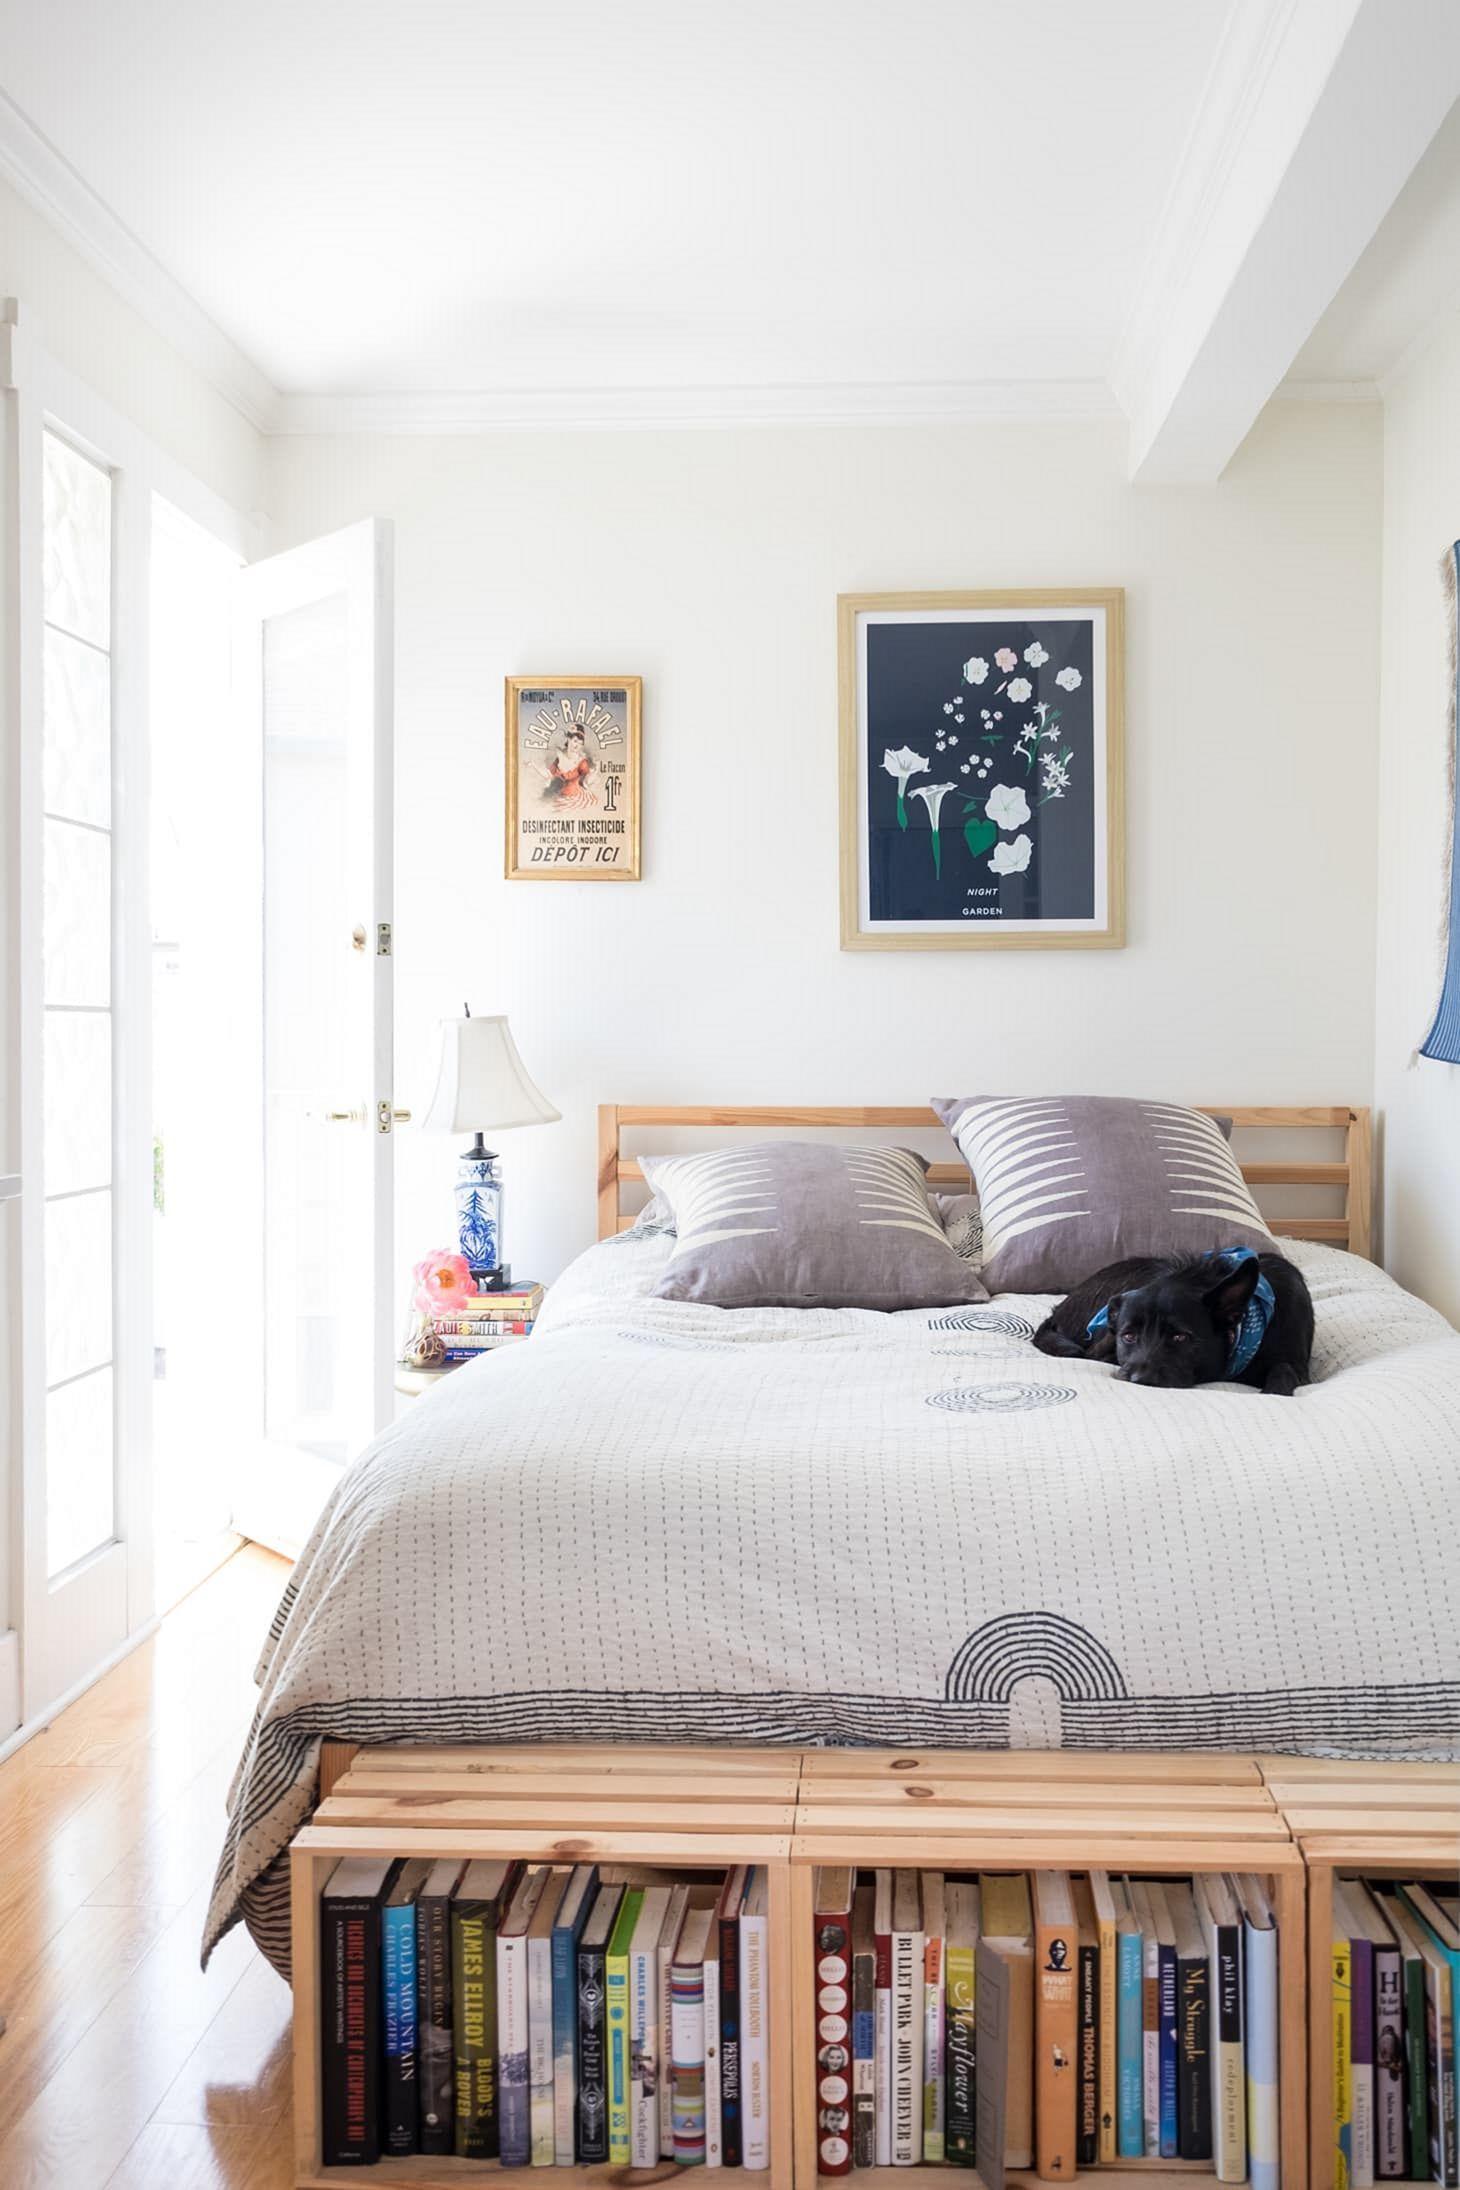 Small Bedroom Storage Ideas To Organize